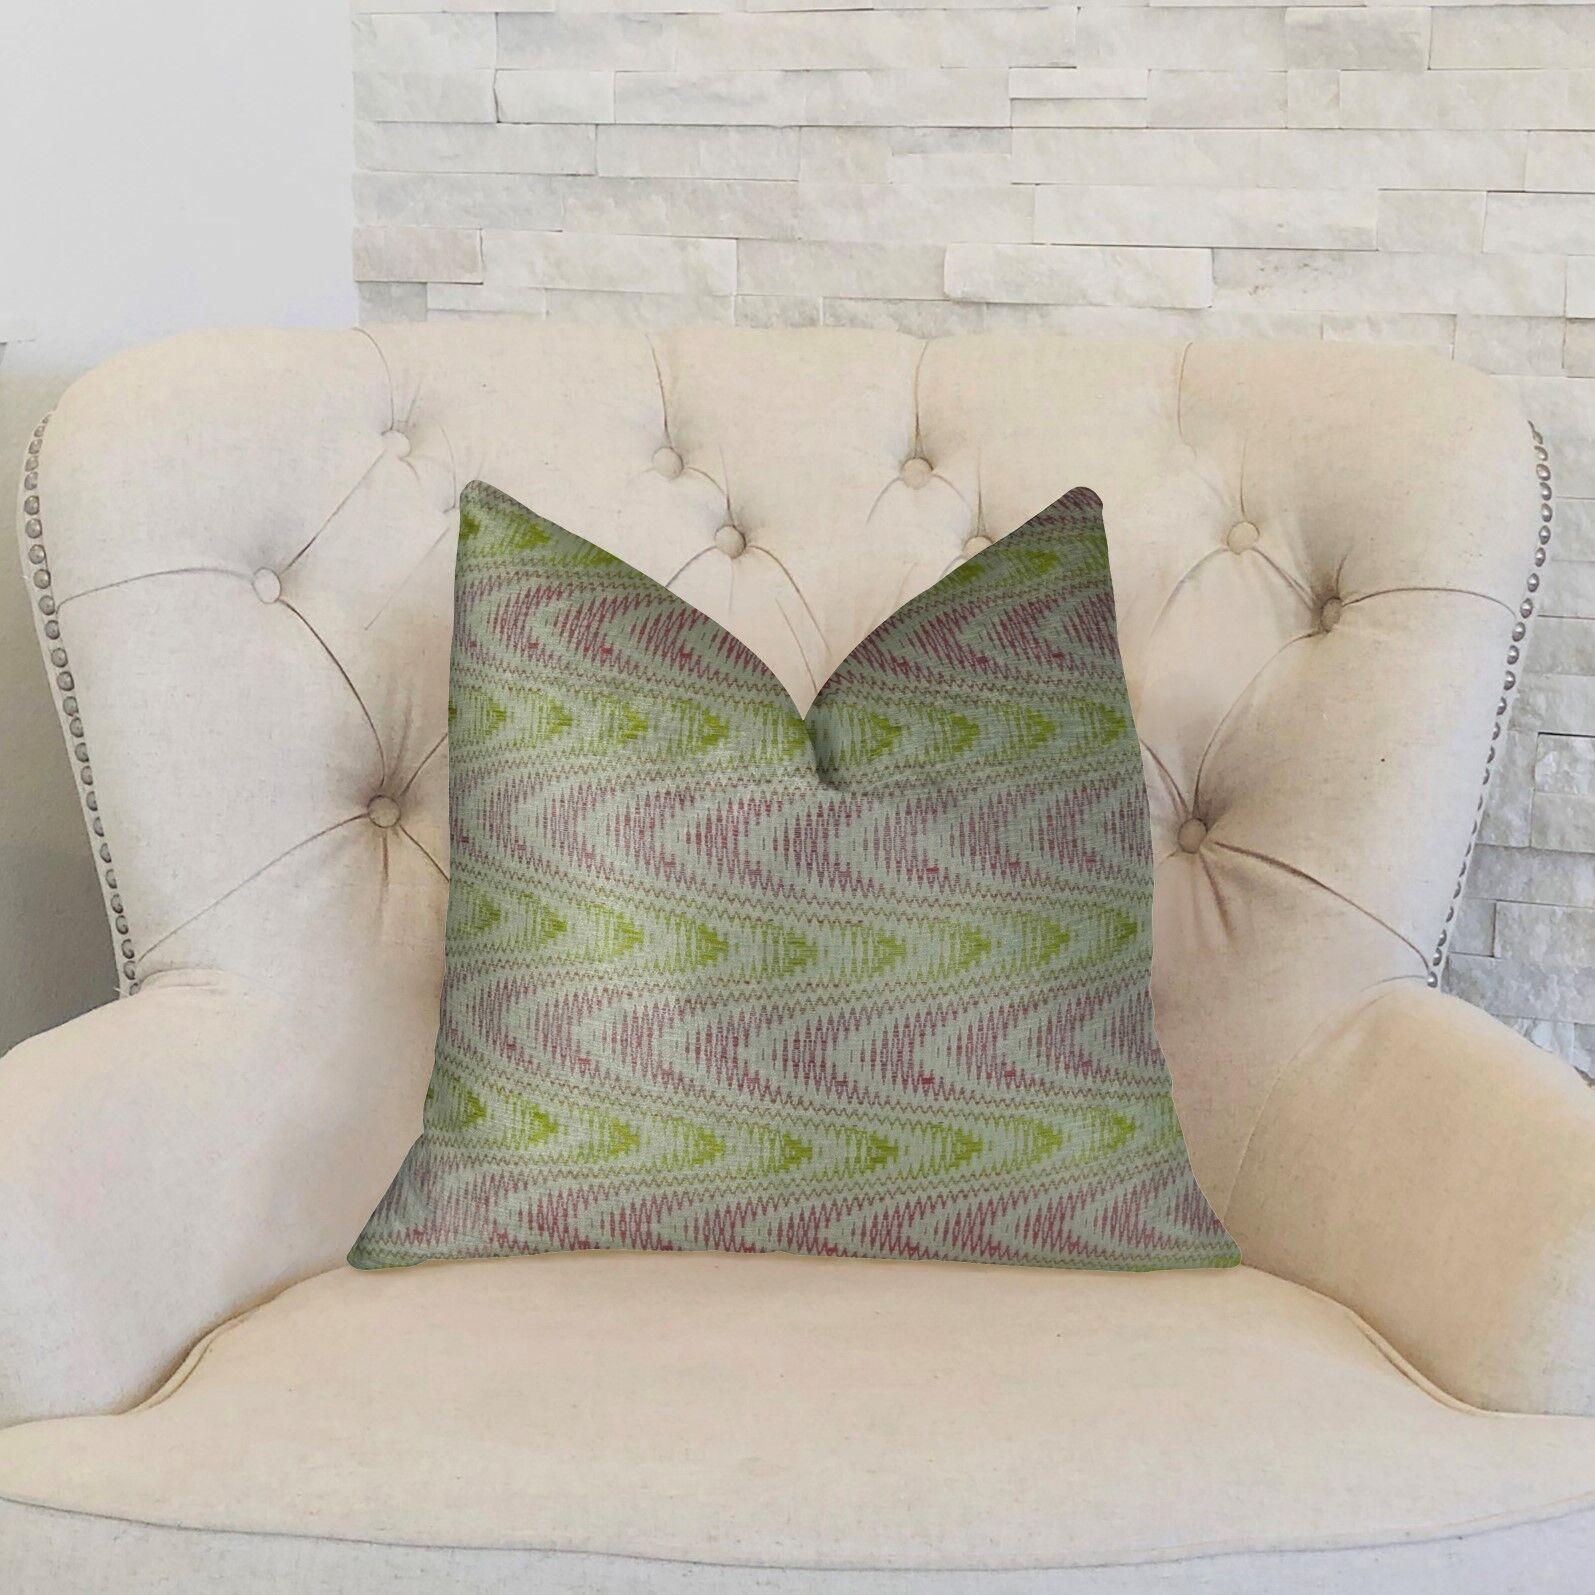 Jara-Scairffia Handmade Luxury Pillow Size: 12